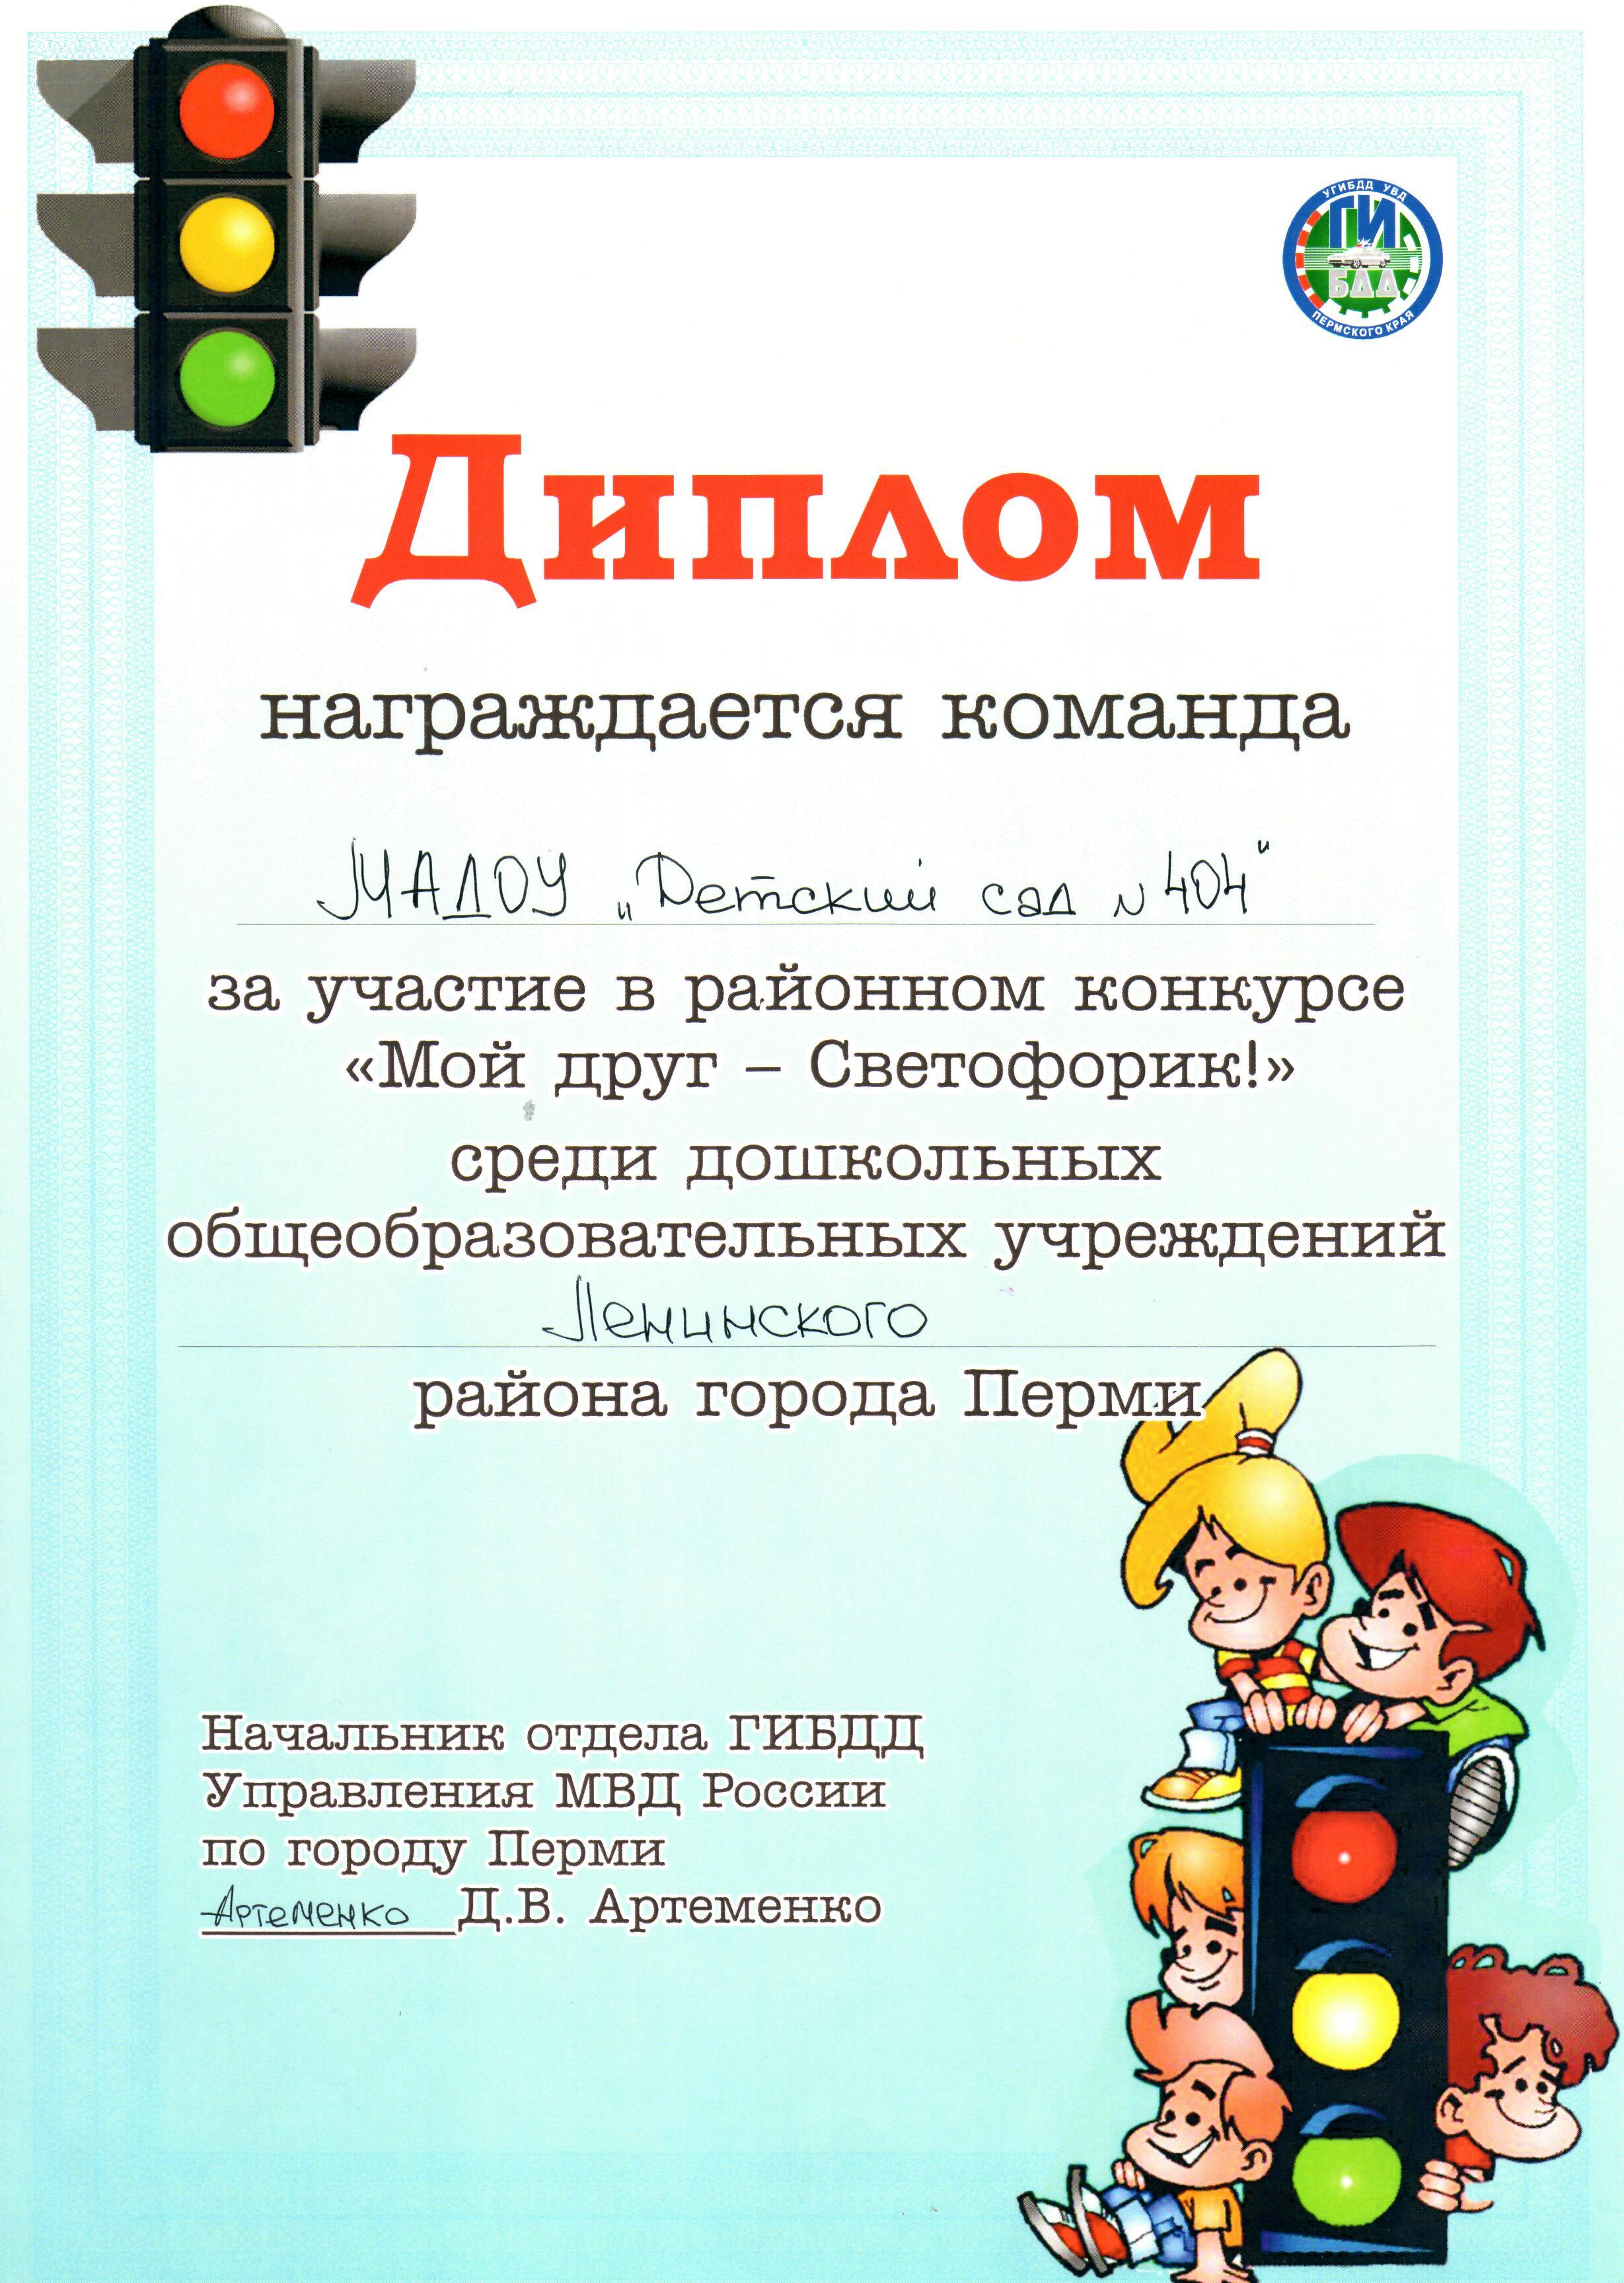 http://detsad404.ucoz.ru/achivements/diplom0060.jpg